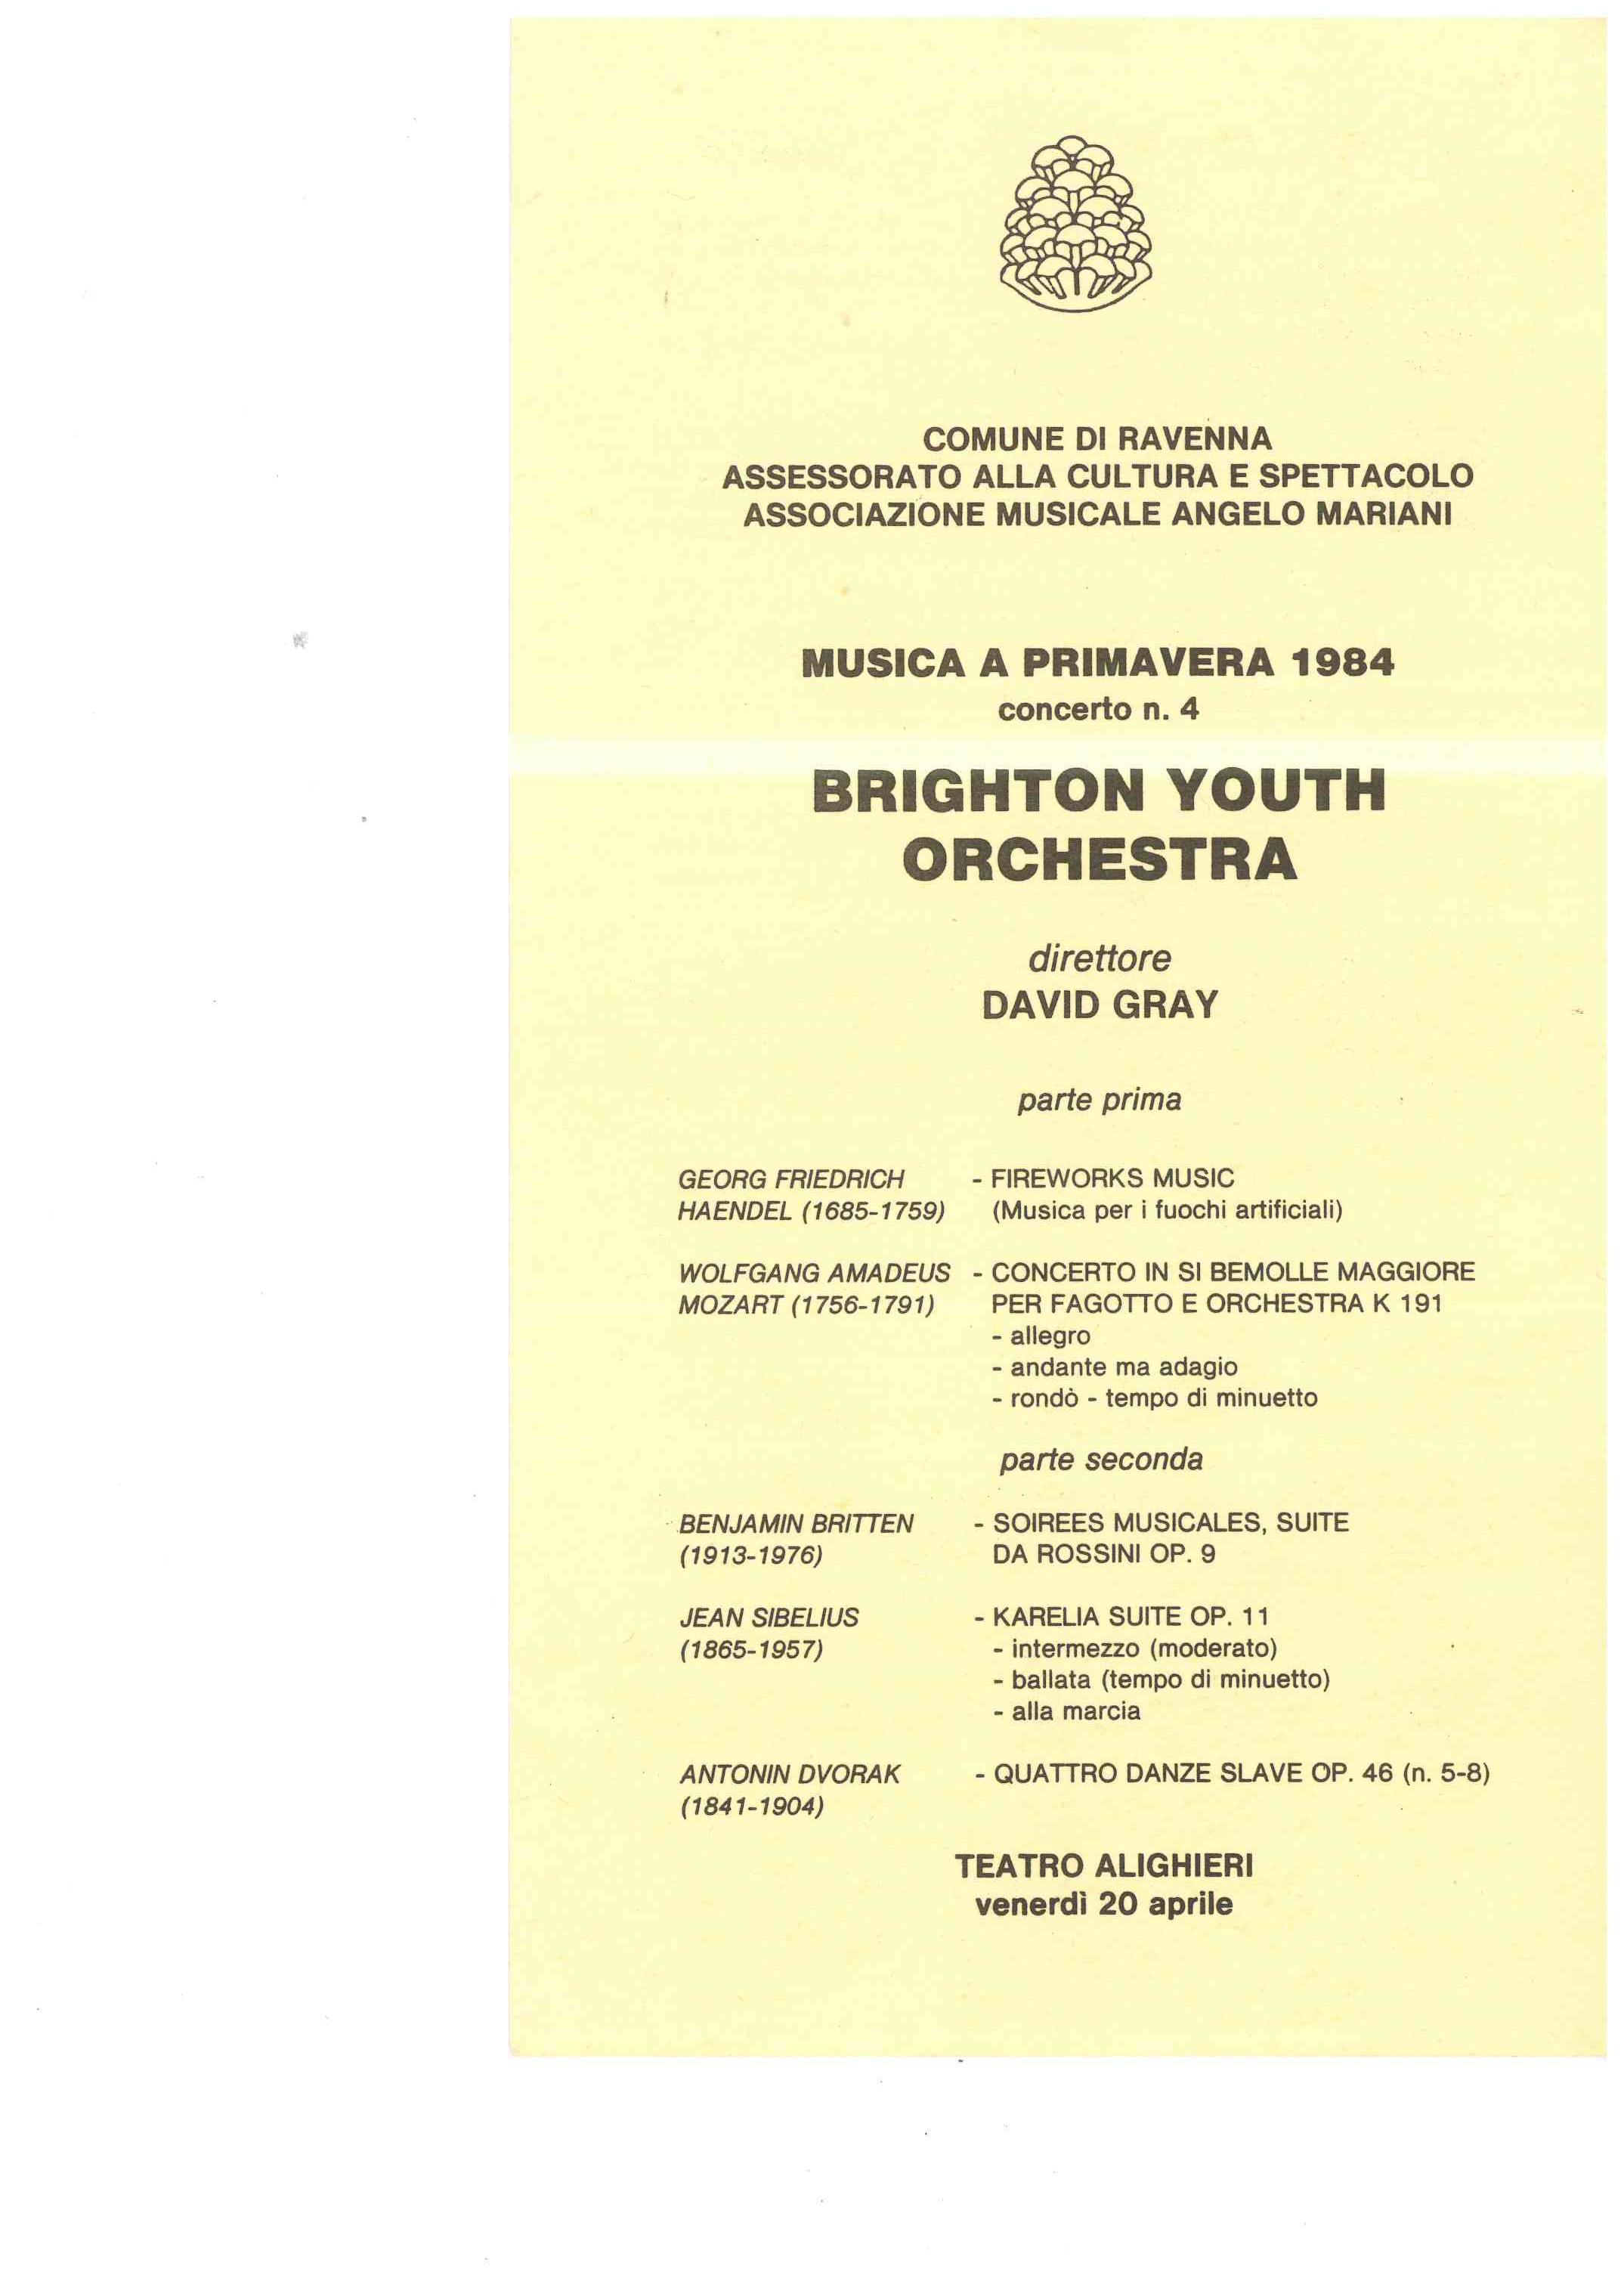 00246-Comune Di Ravenna, 20th April 1984.jpg